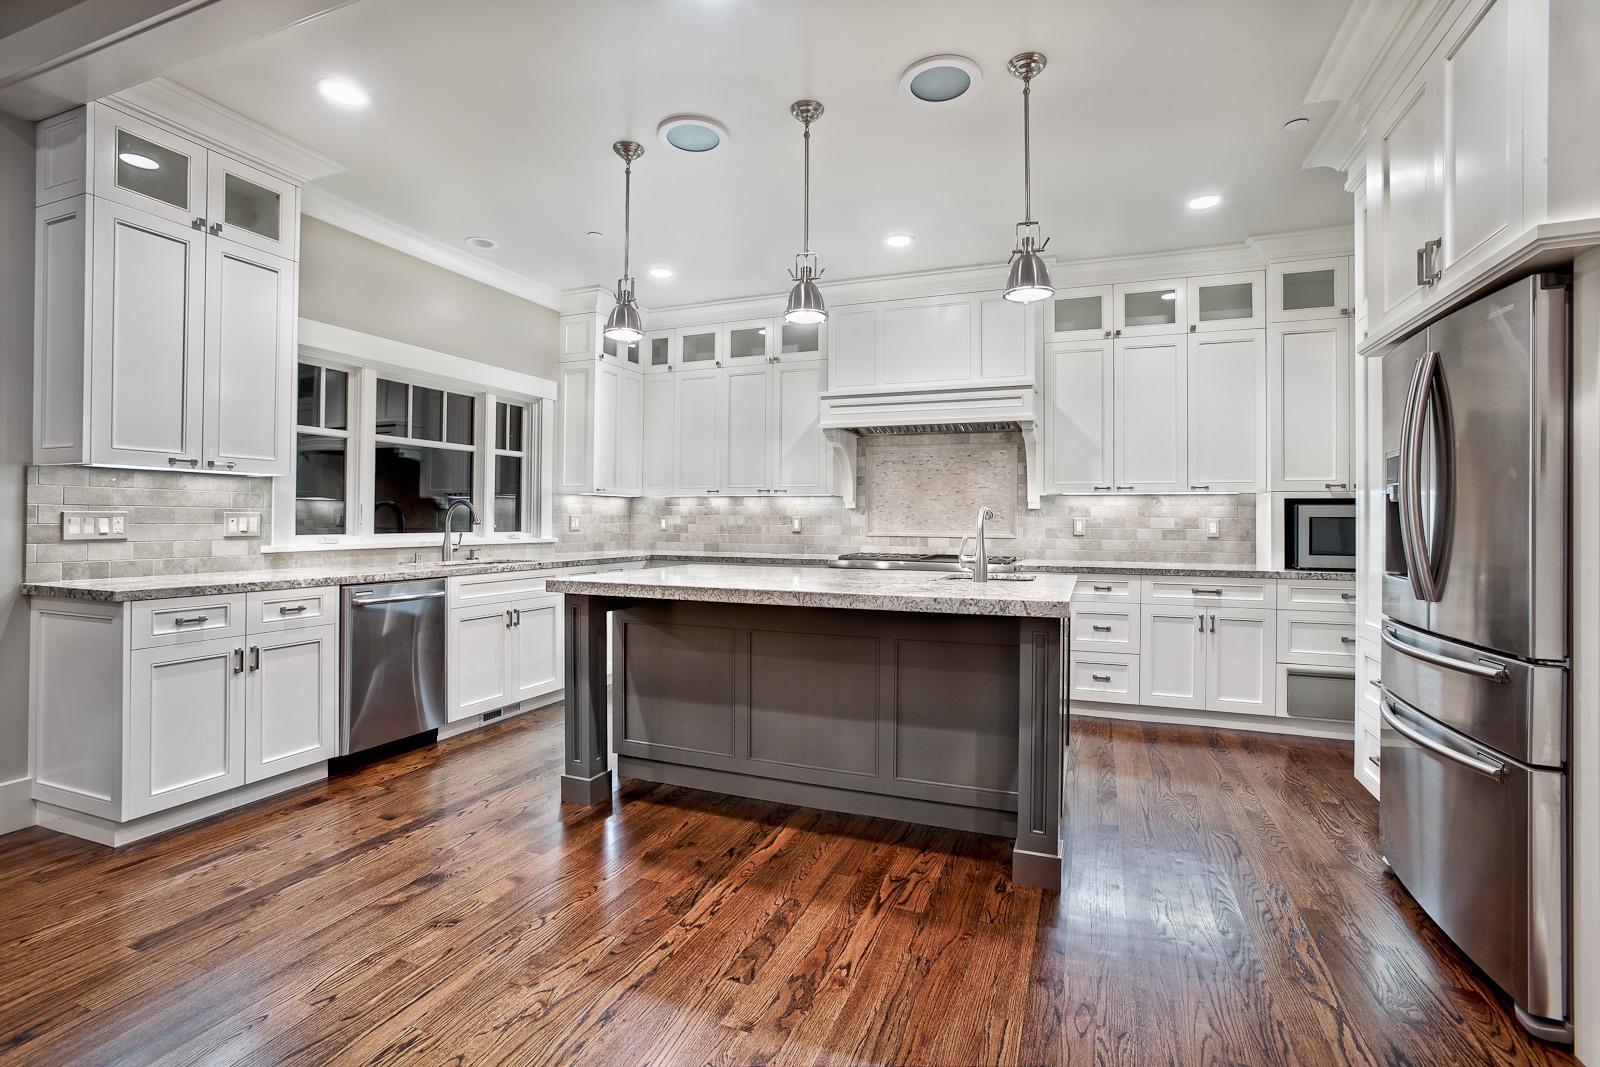 Custom design cabinets jmarvinhandyman for Custom kitchen cabinets